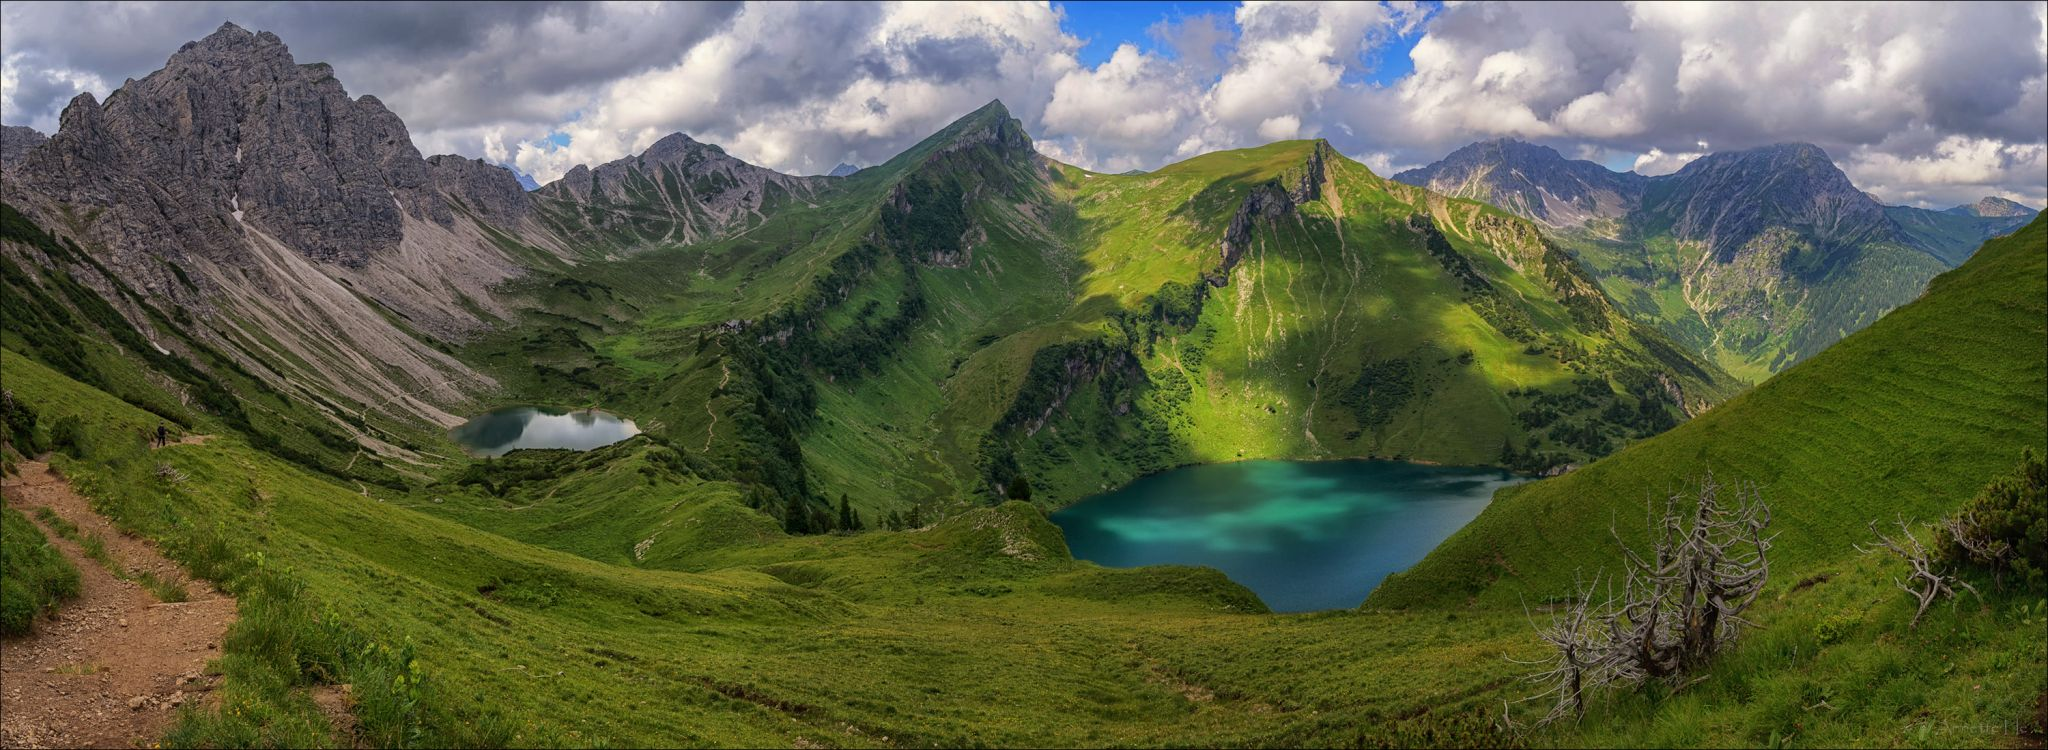 Traualpsee, Austria